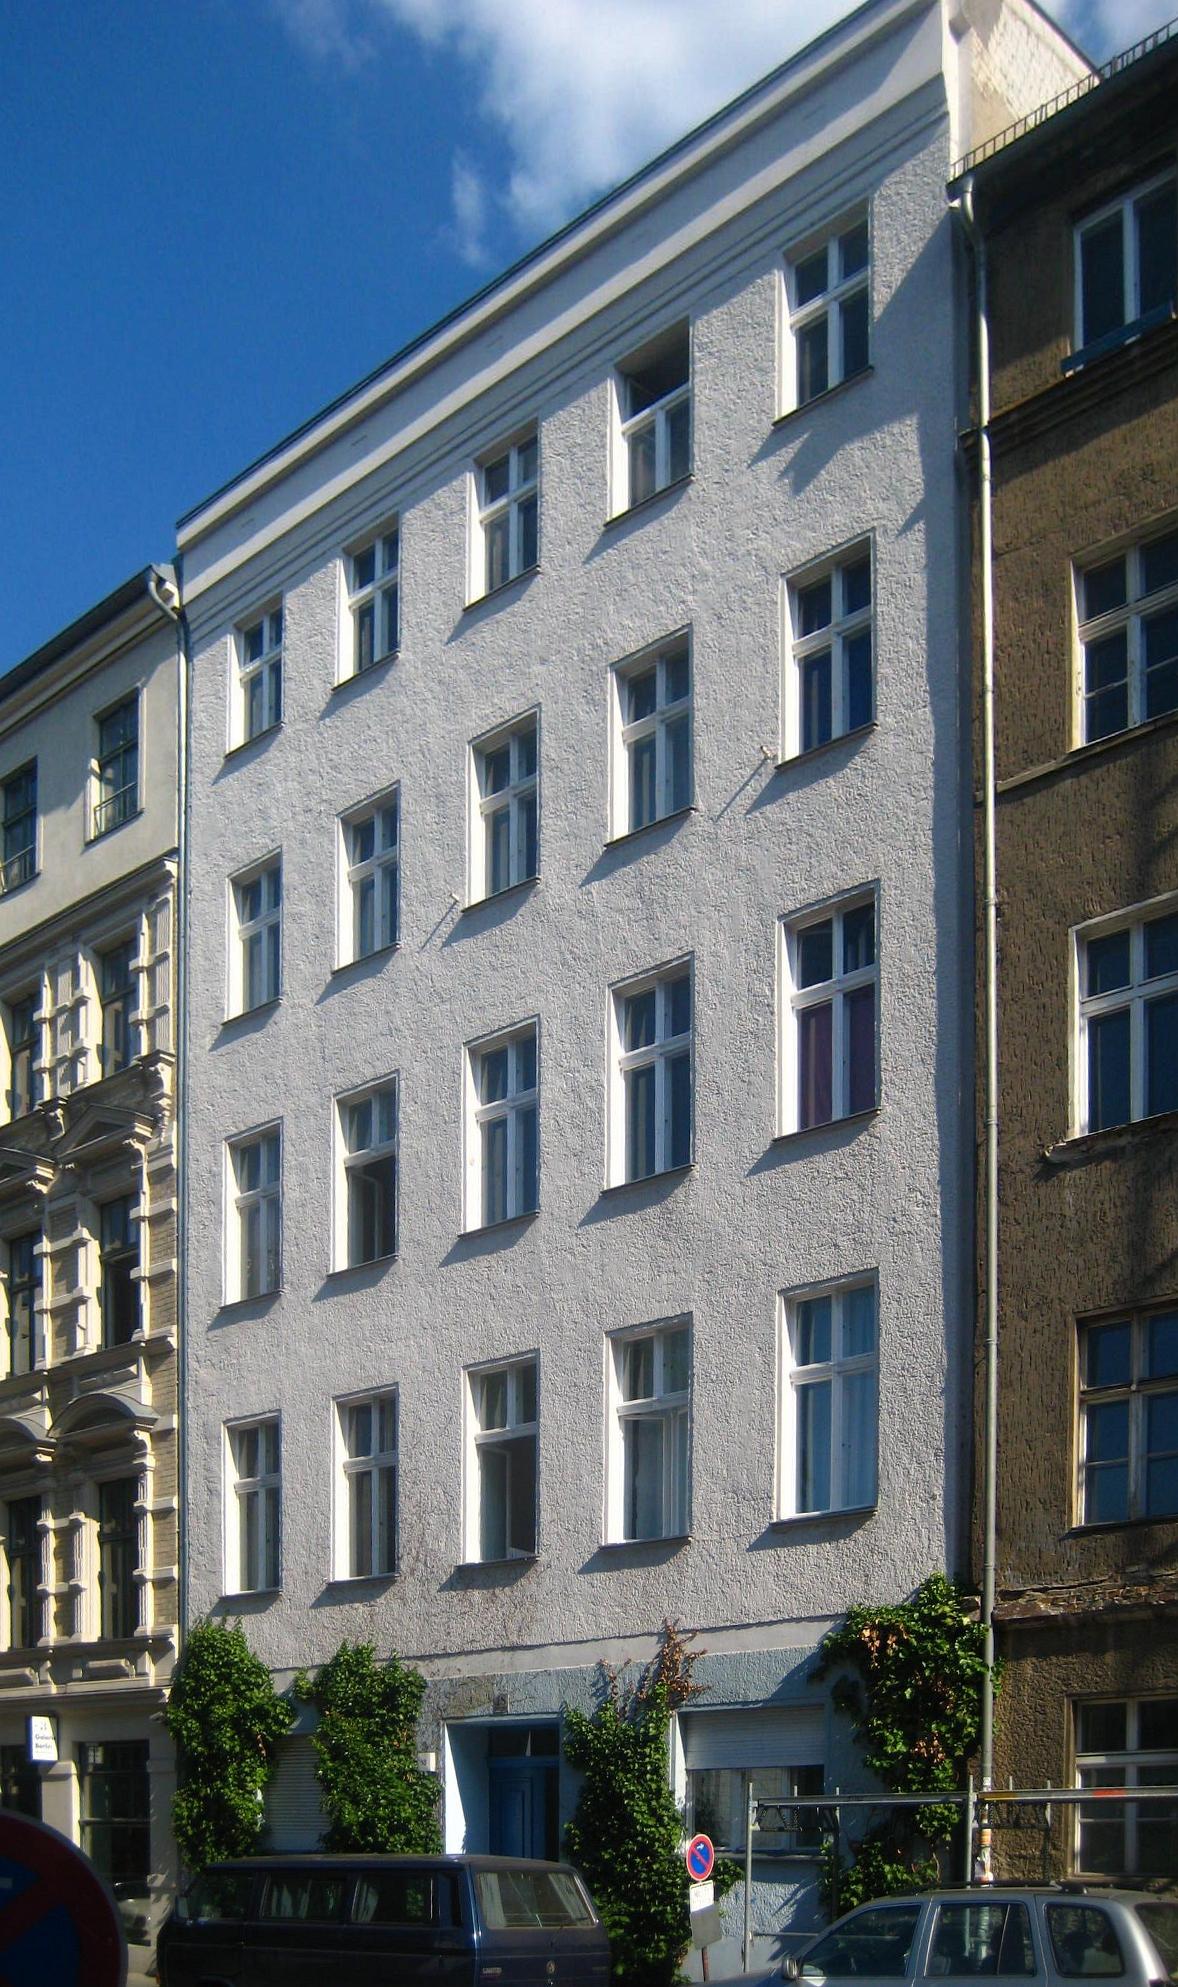 datei berlin mitte auguststrasse 18 mietshaus wikipedia. Black Bedroom Furniture Sets. Home Design Ideas